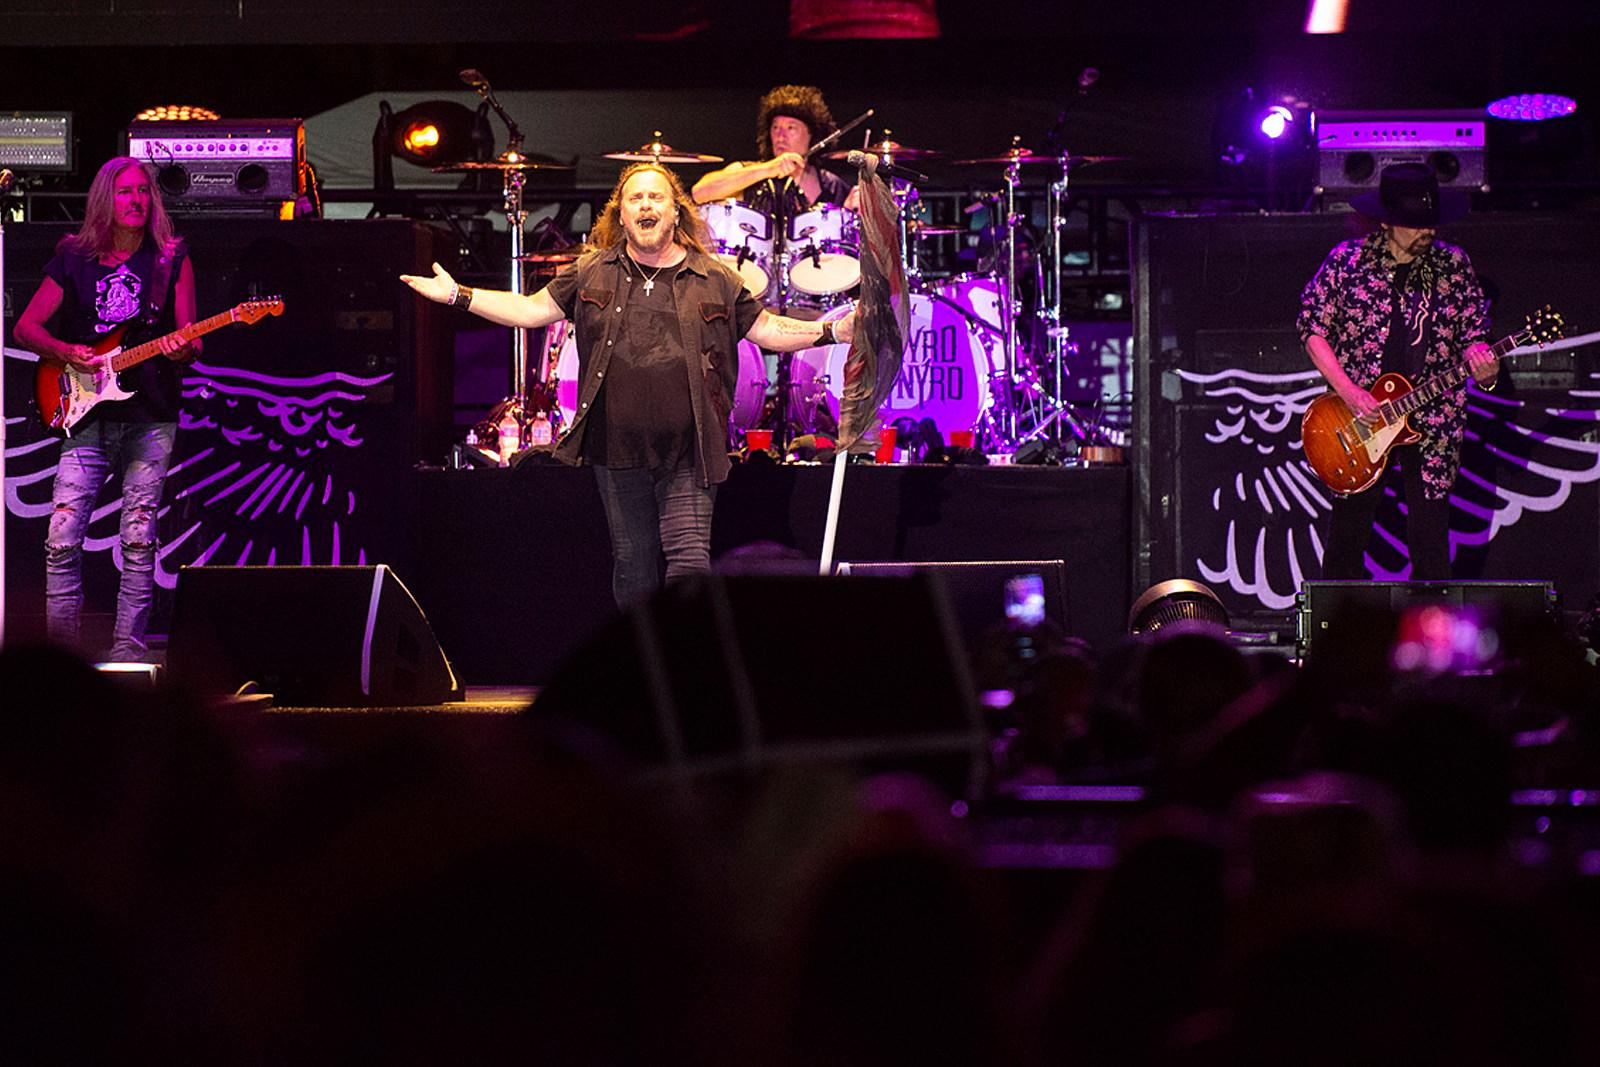 E a d g b e. No 14 Lynyrd Skynyrd Sweet Home Alabama Top 100 Classic Rock Songs